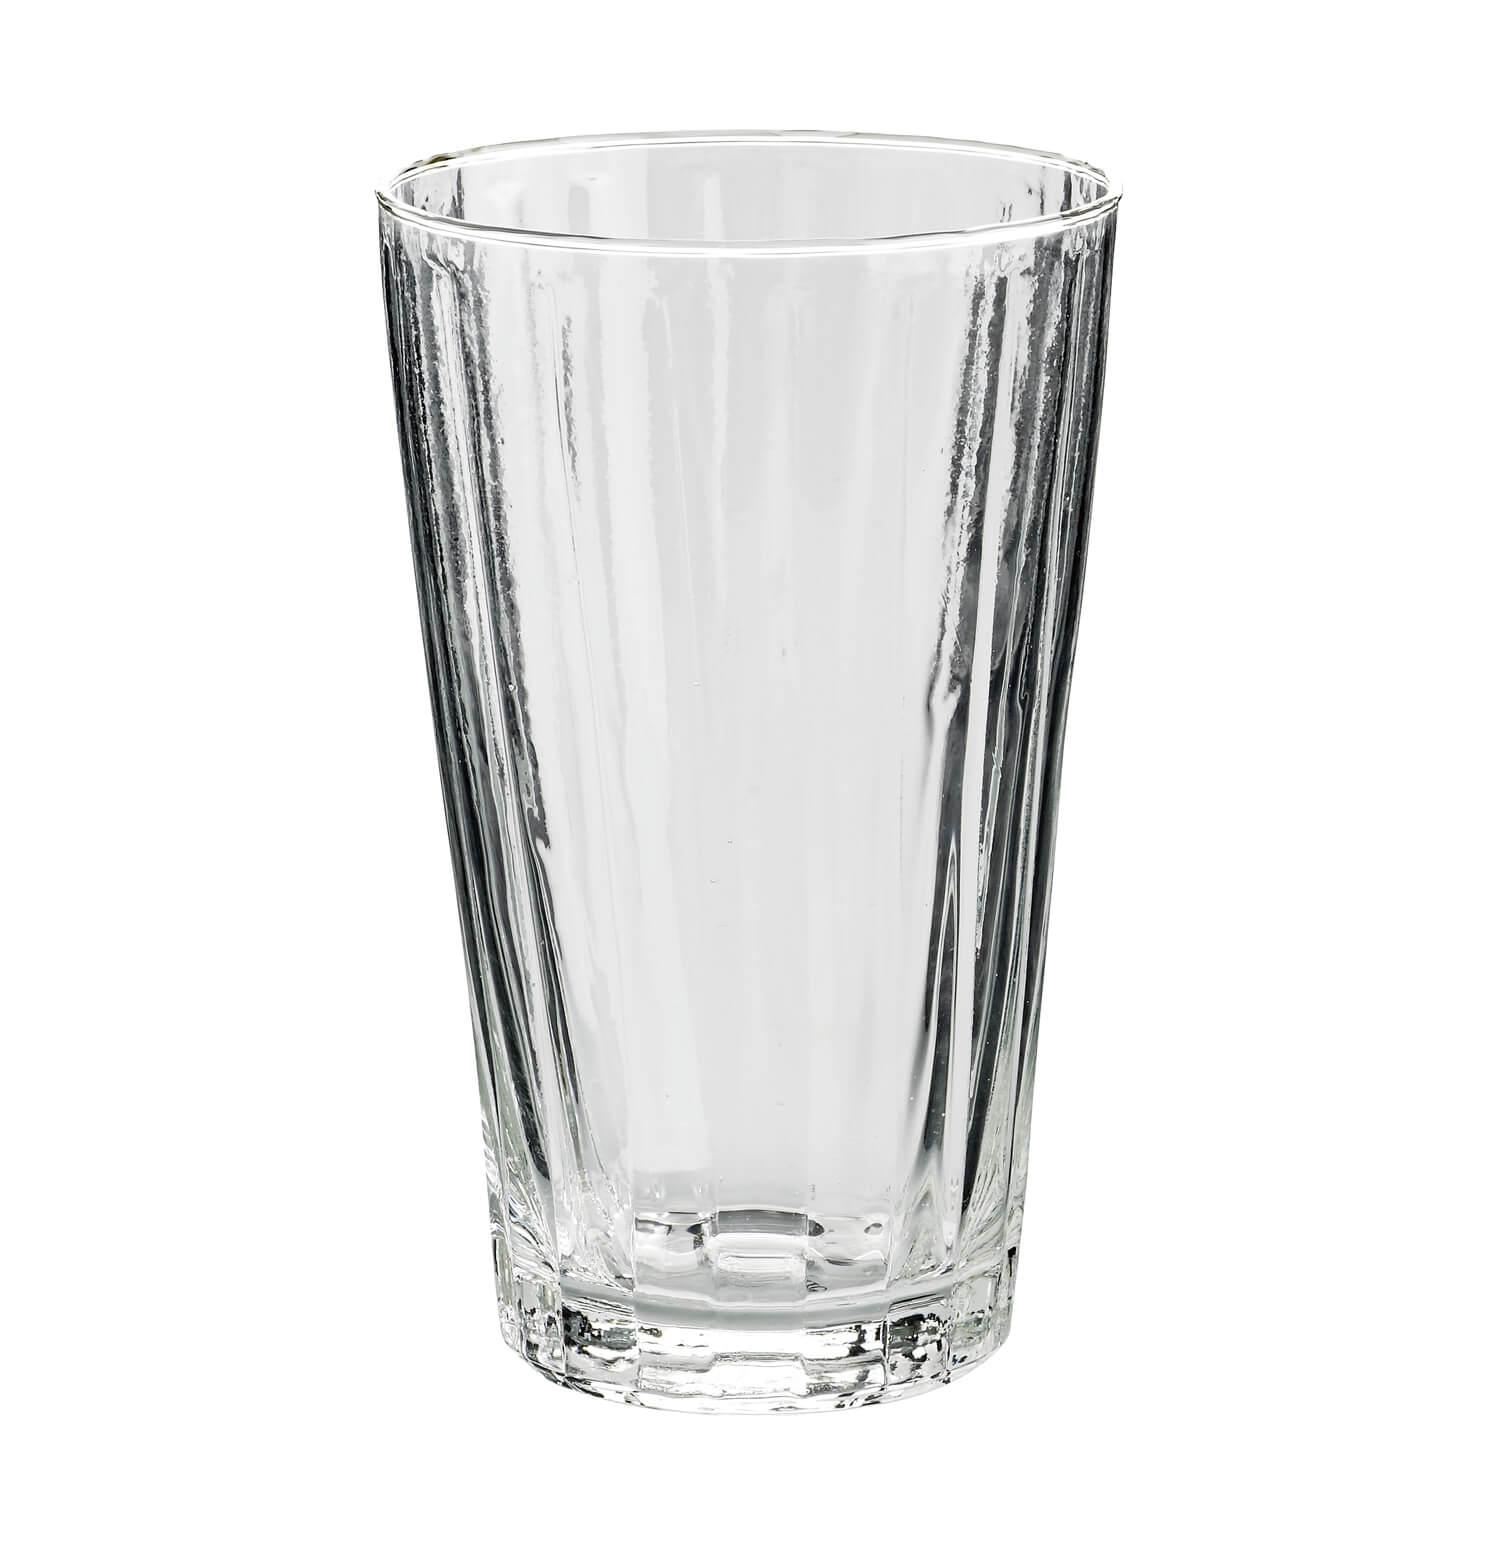 TineK Rillendesign-Glas L